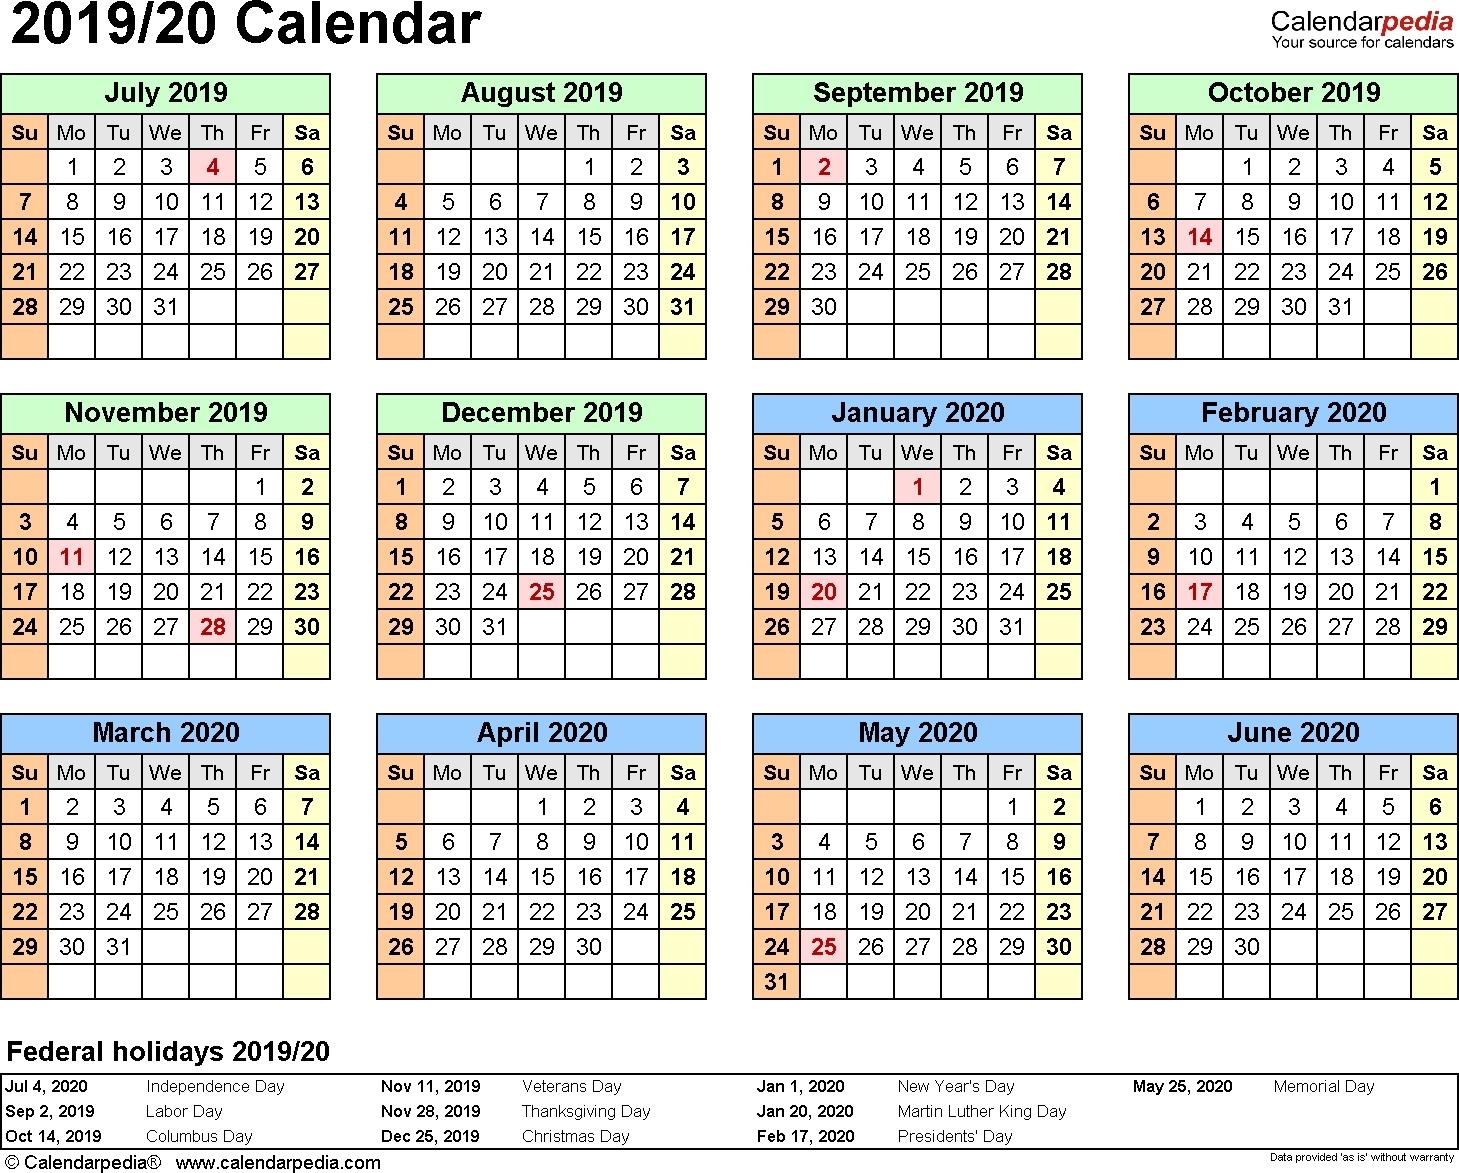 Financial Calendar 2019- 2020 Printable.au - Calendar  Australia What Are The Dates For The 18/19 Financial Year